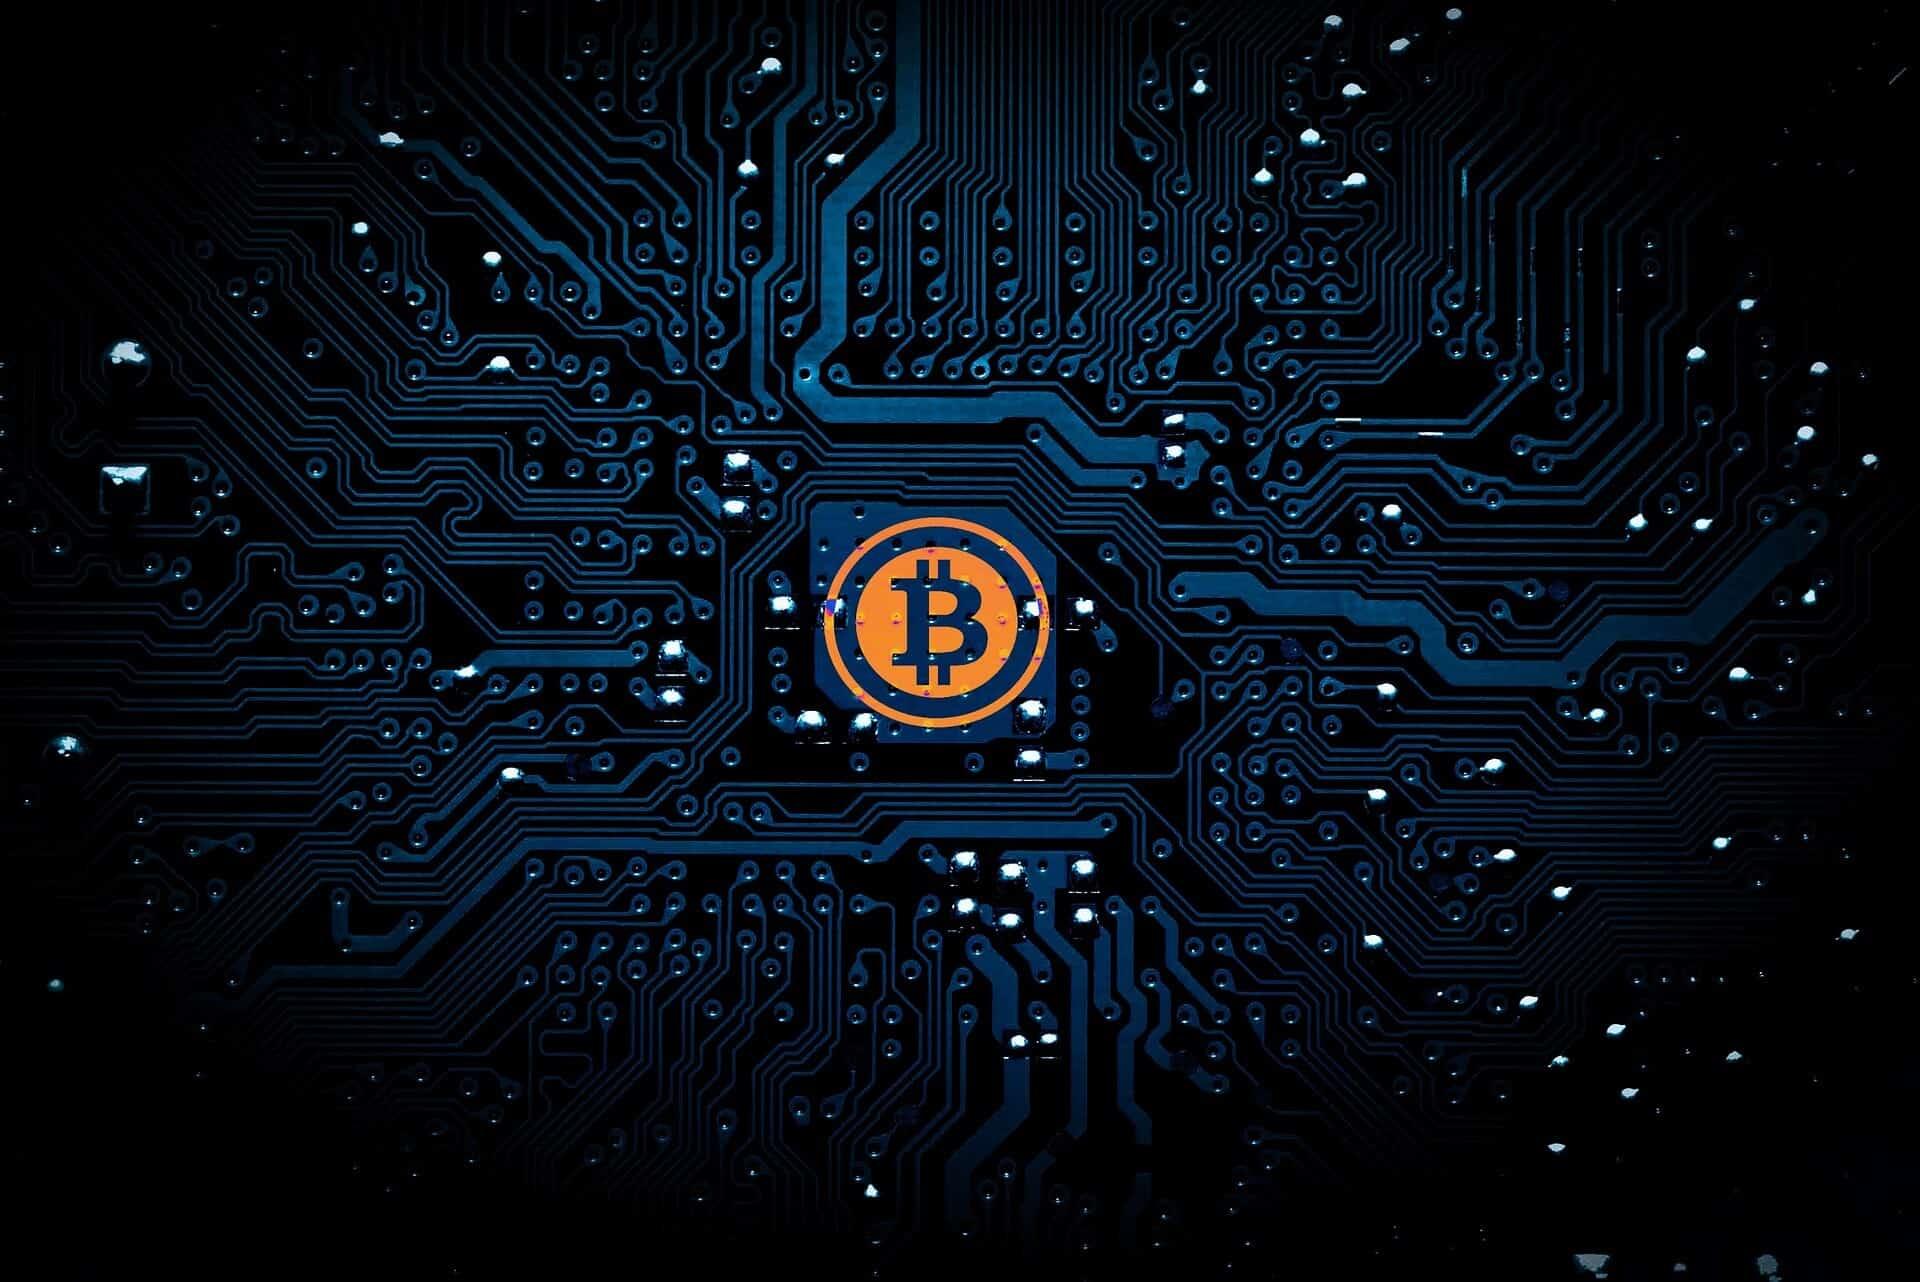 Bitcoin Moves Past $11,000 Mark Momentarily